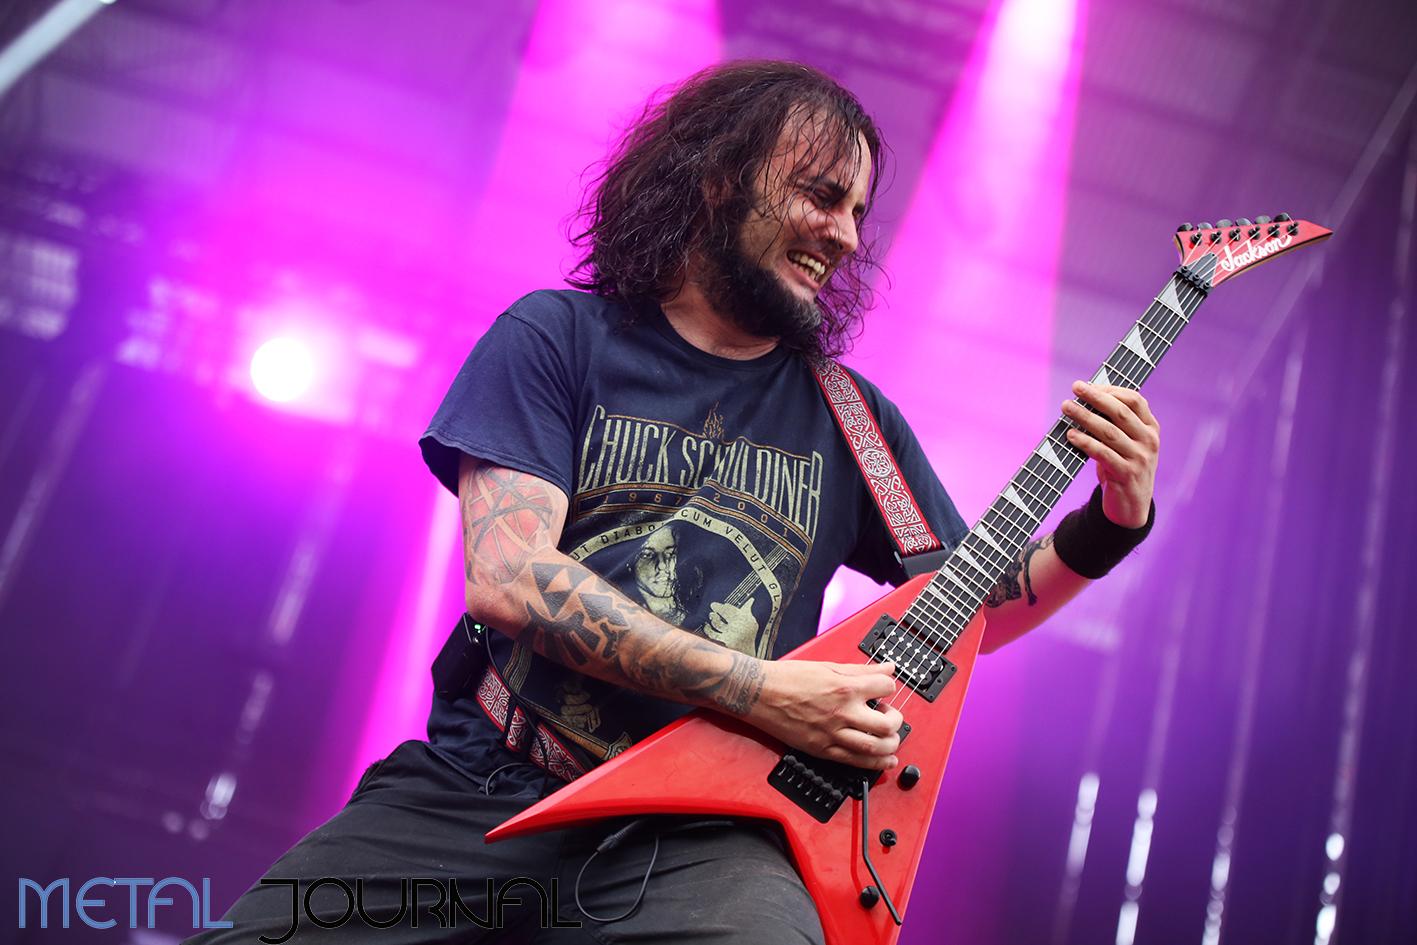 angelus apatrida - metal journal rock fest barcelona 2019 pic 3